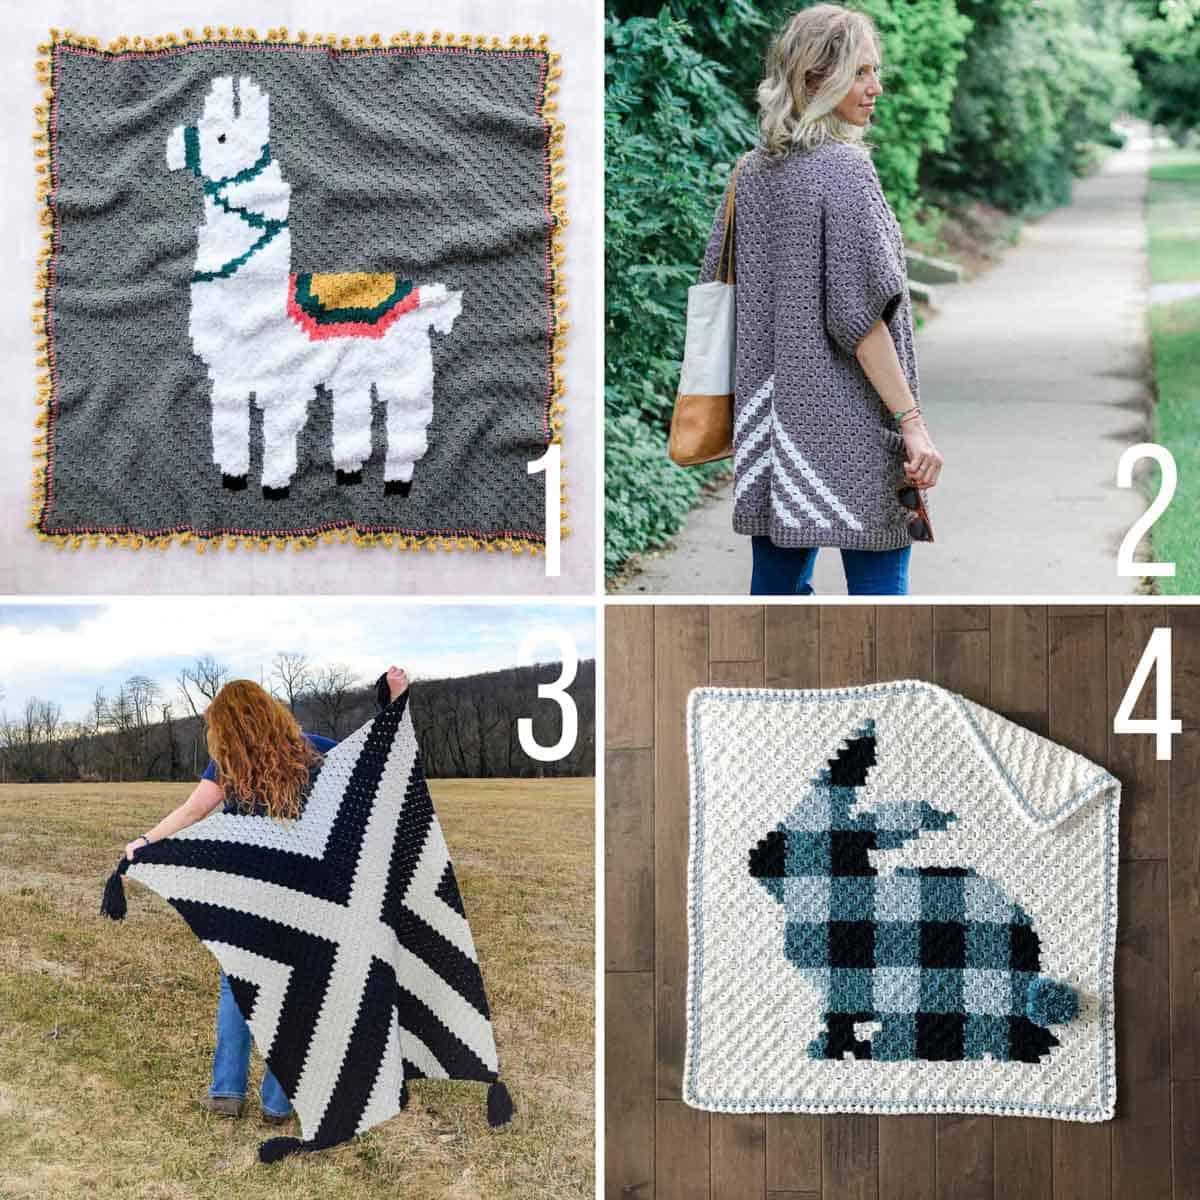 A grid of four c2c crochet (corner to corner) crochet patterns featuring Lion Brand yarn.